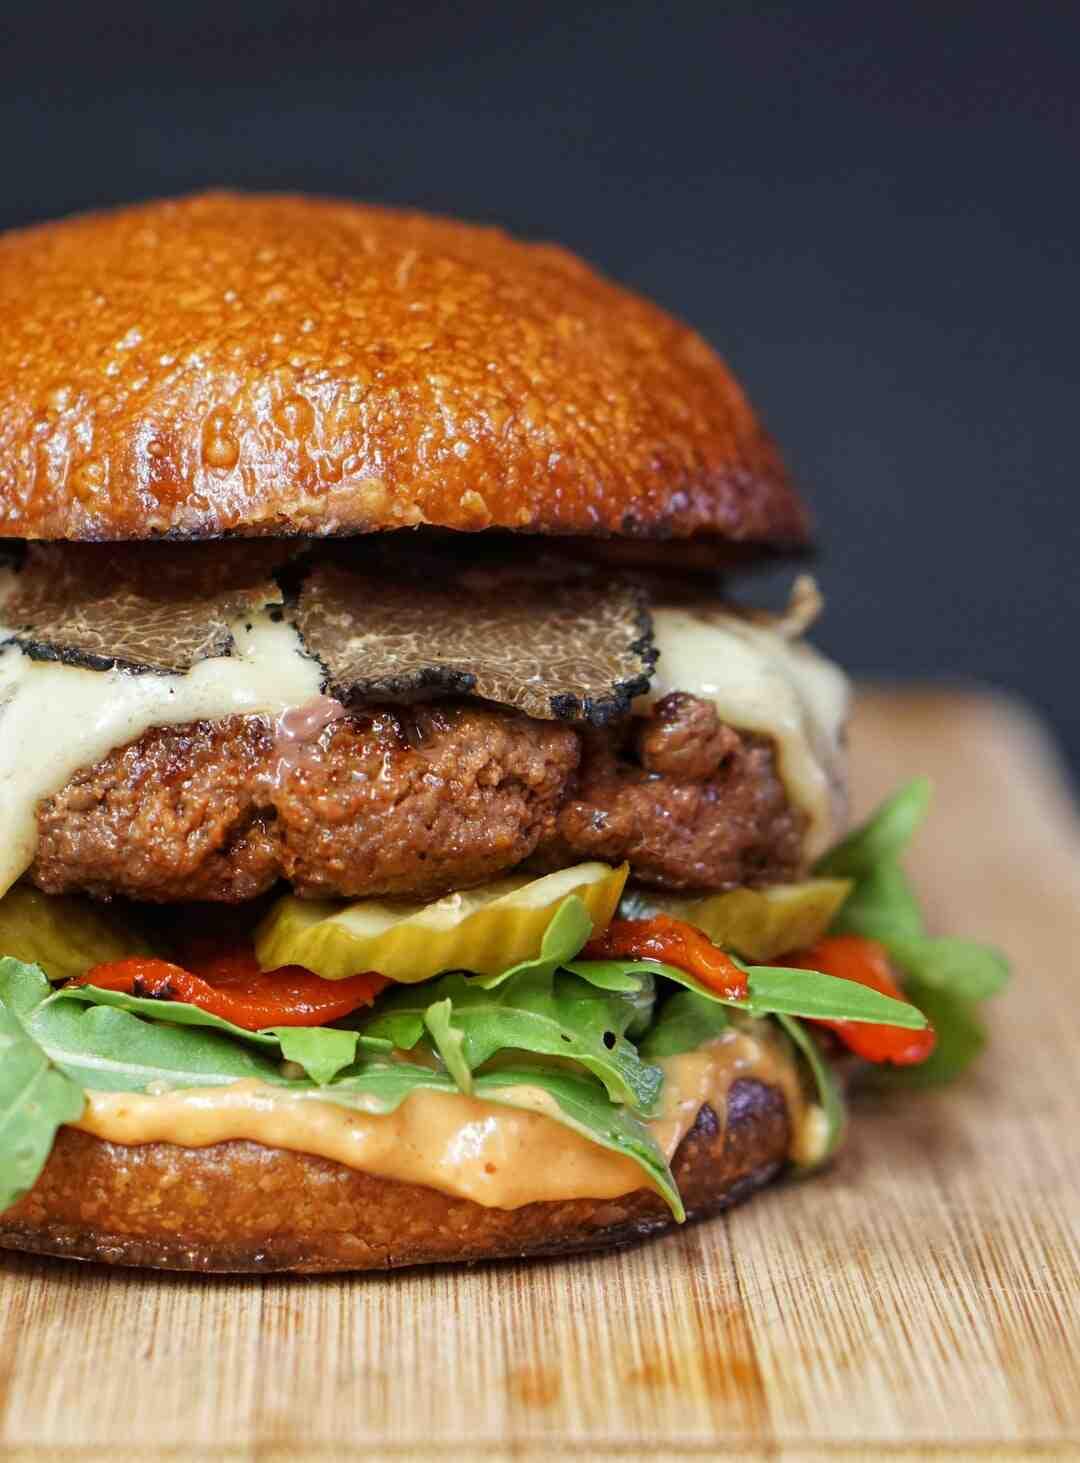 Comment manger un hamburger